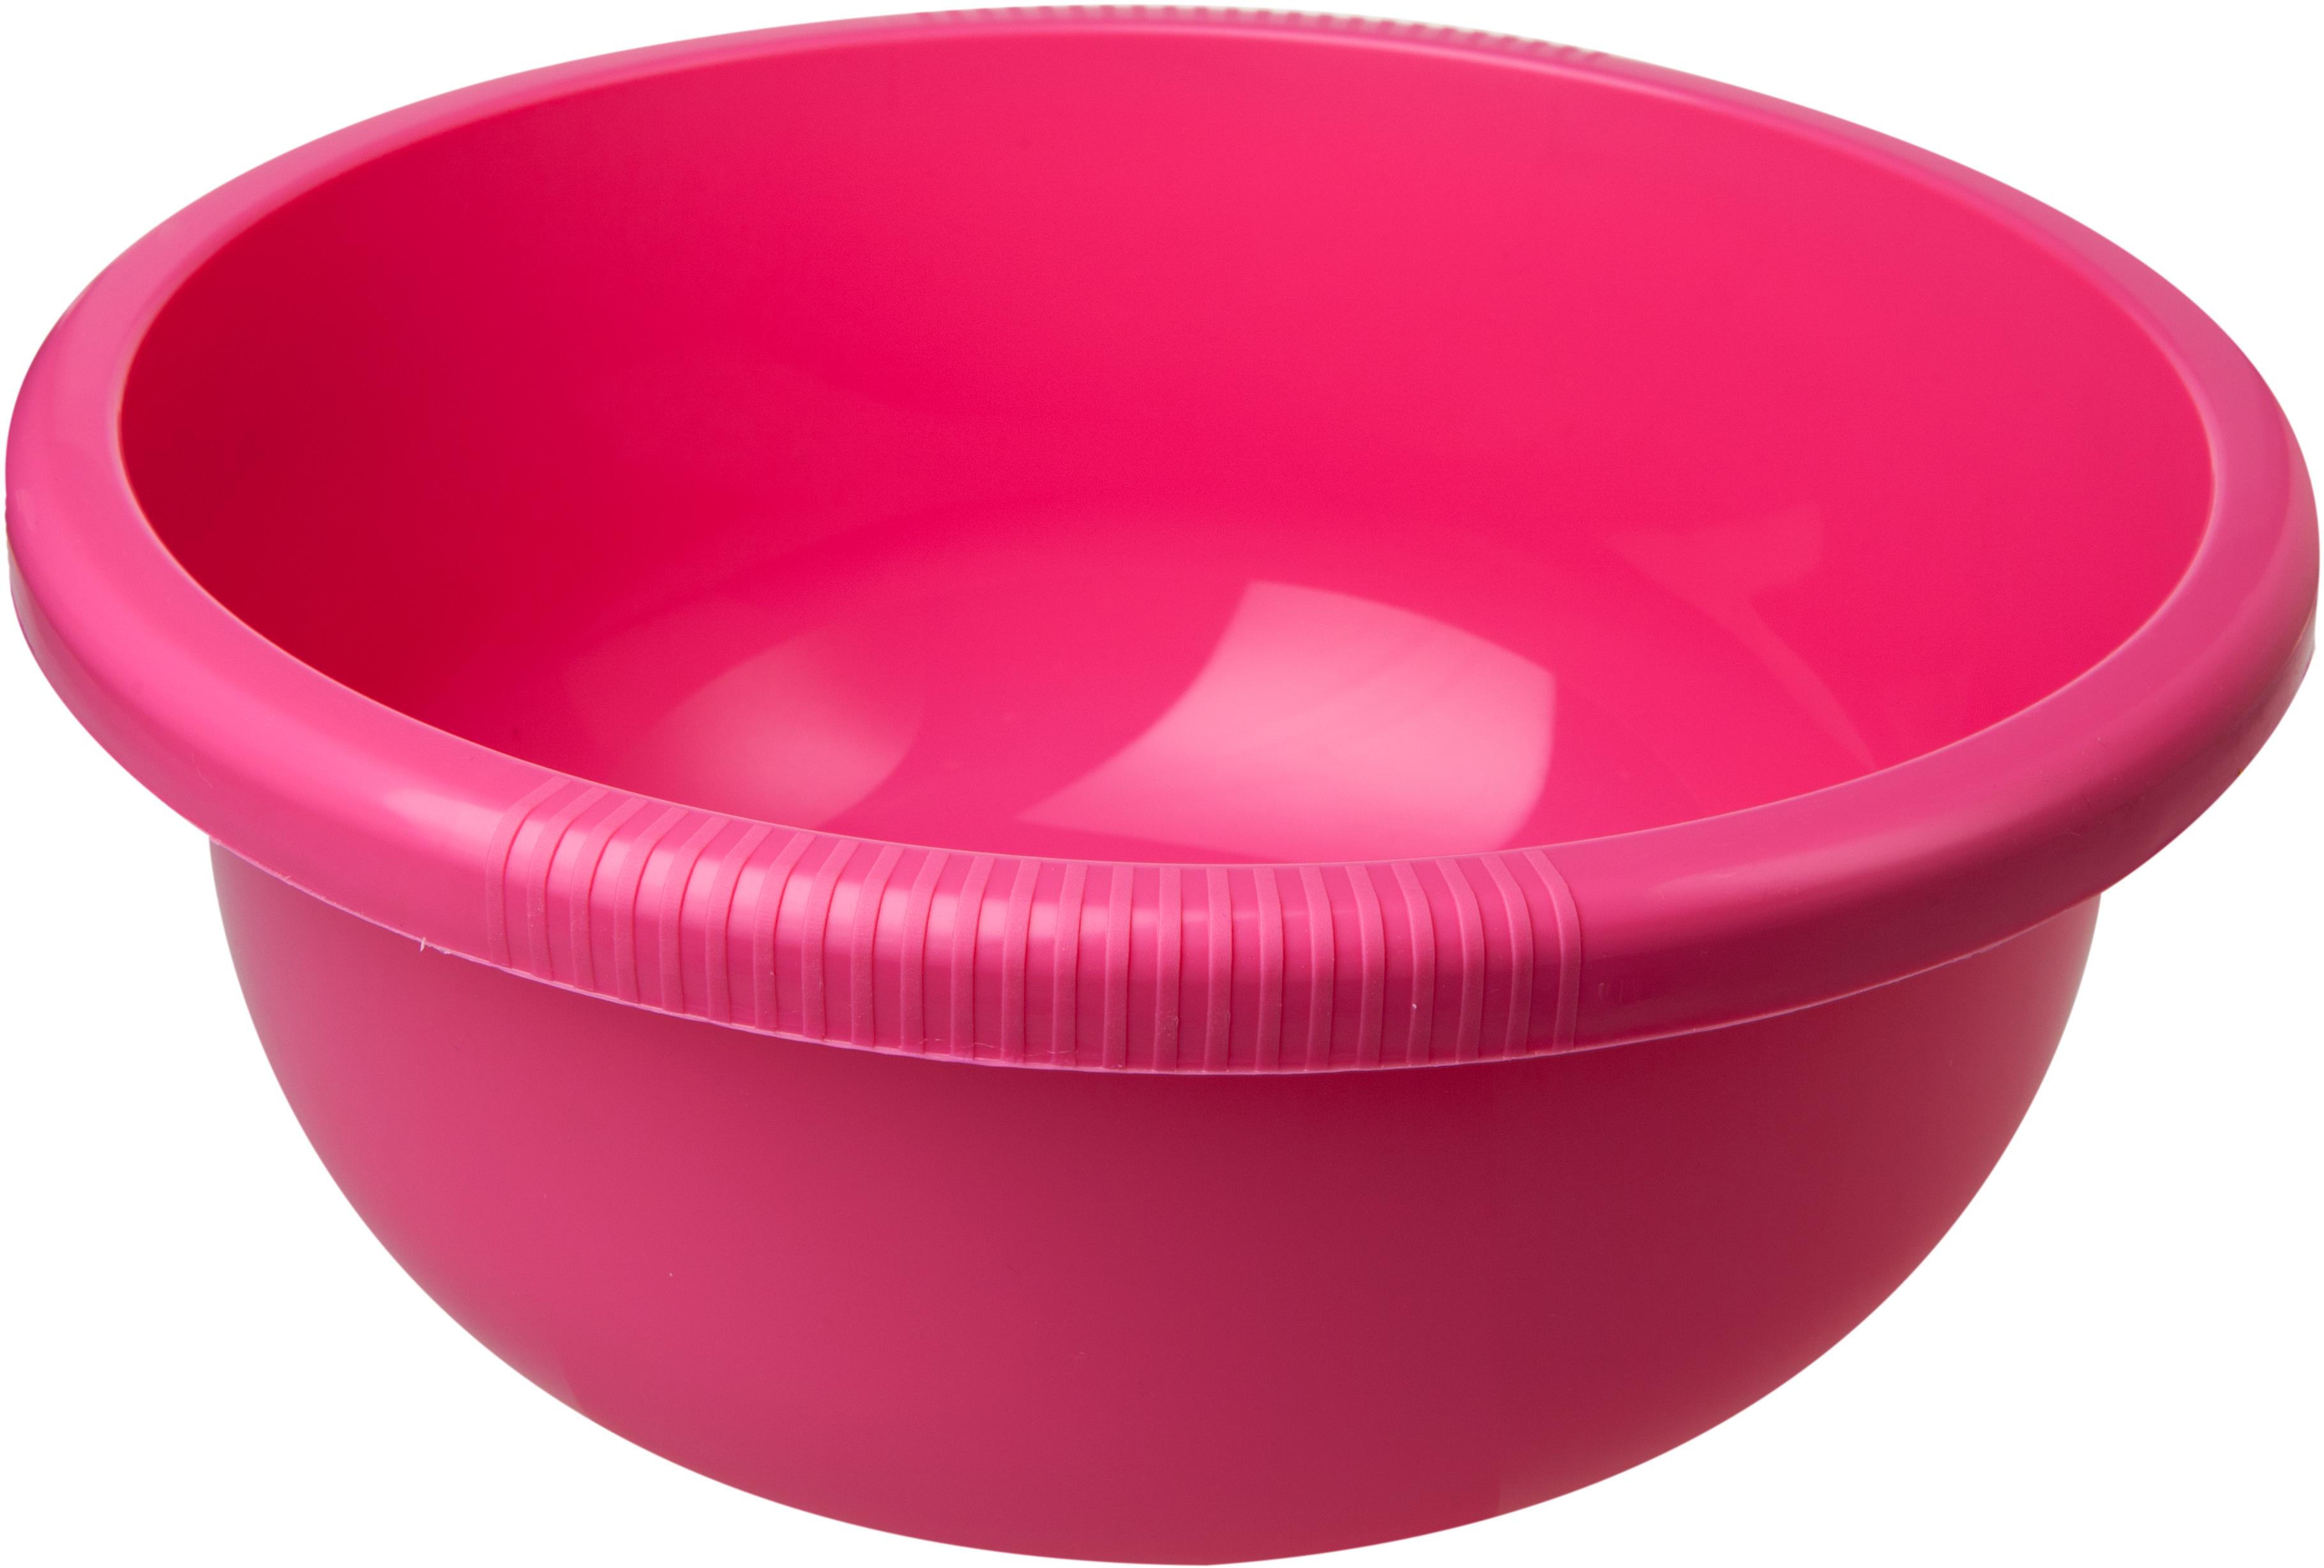 Миска Plast Team, цвет: коралловый, круглая, 4 л миска plast team purpur с крышкой 1 2 л